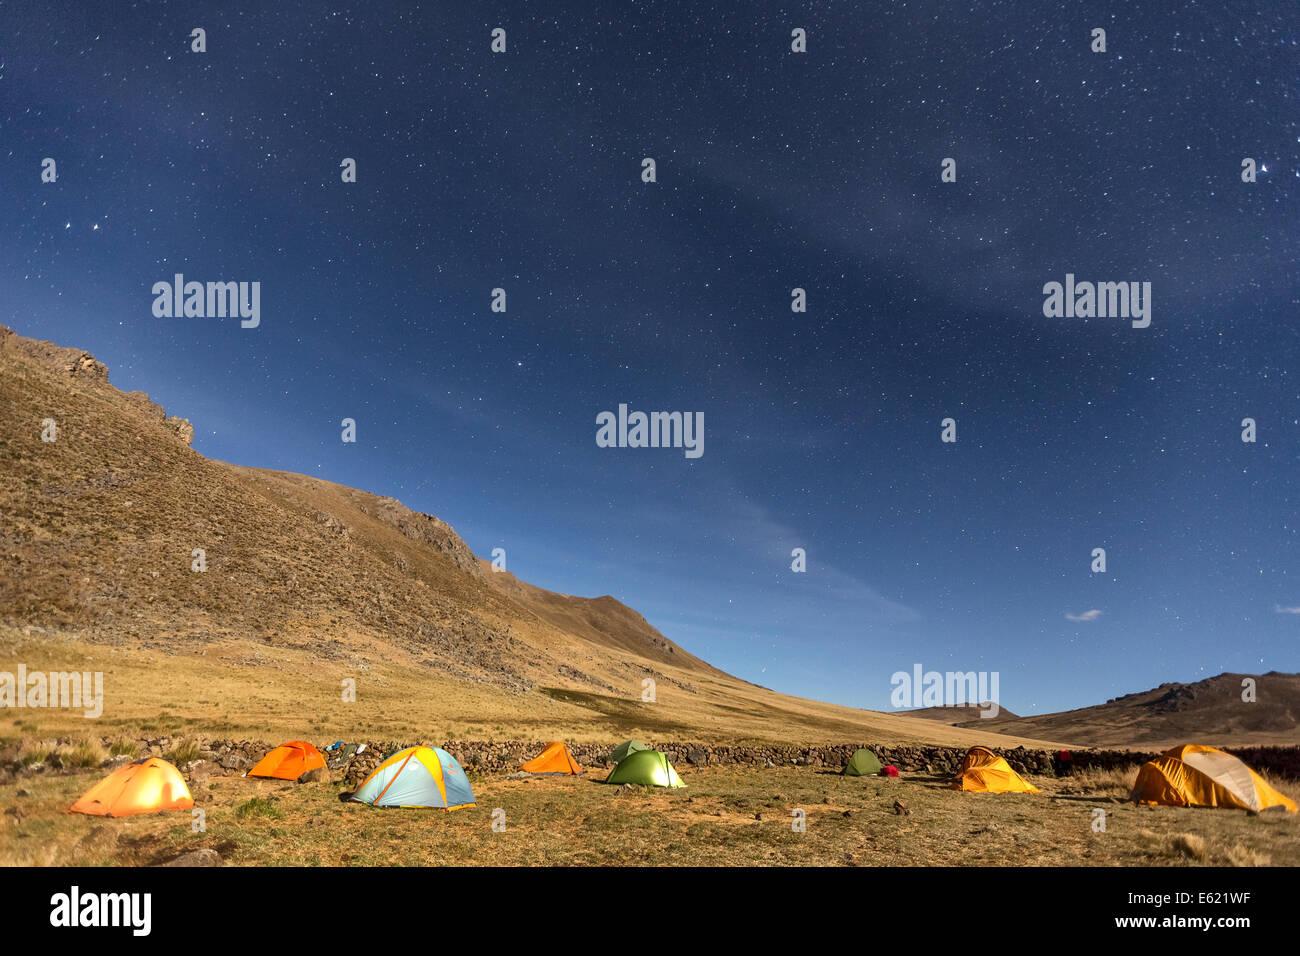 Tent camping at Hatun Machay rock climbing place, Cordillera Negra, Peru, South America - Stock Image